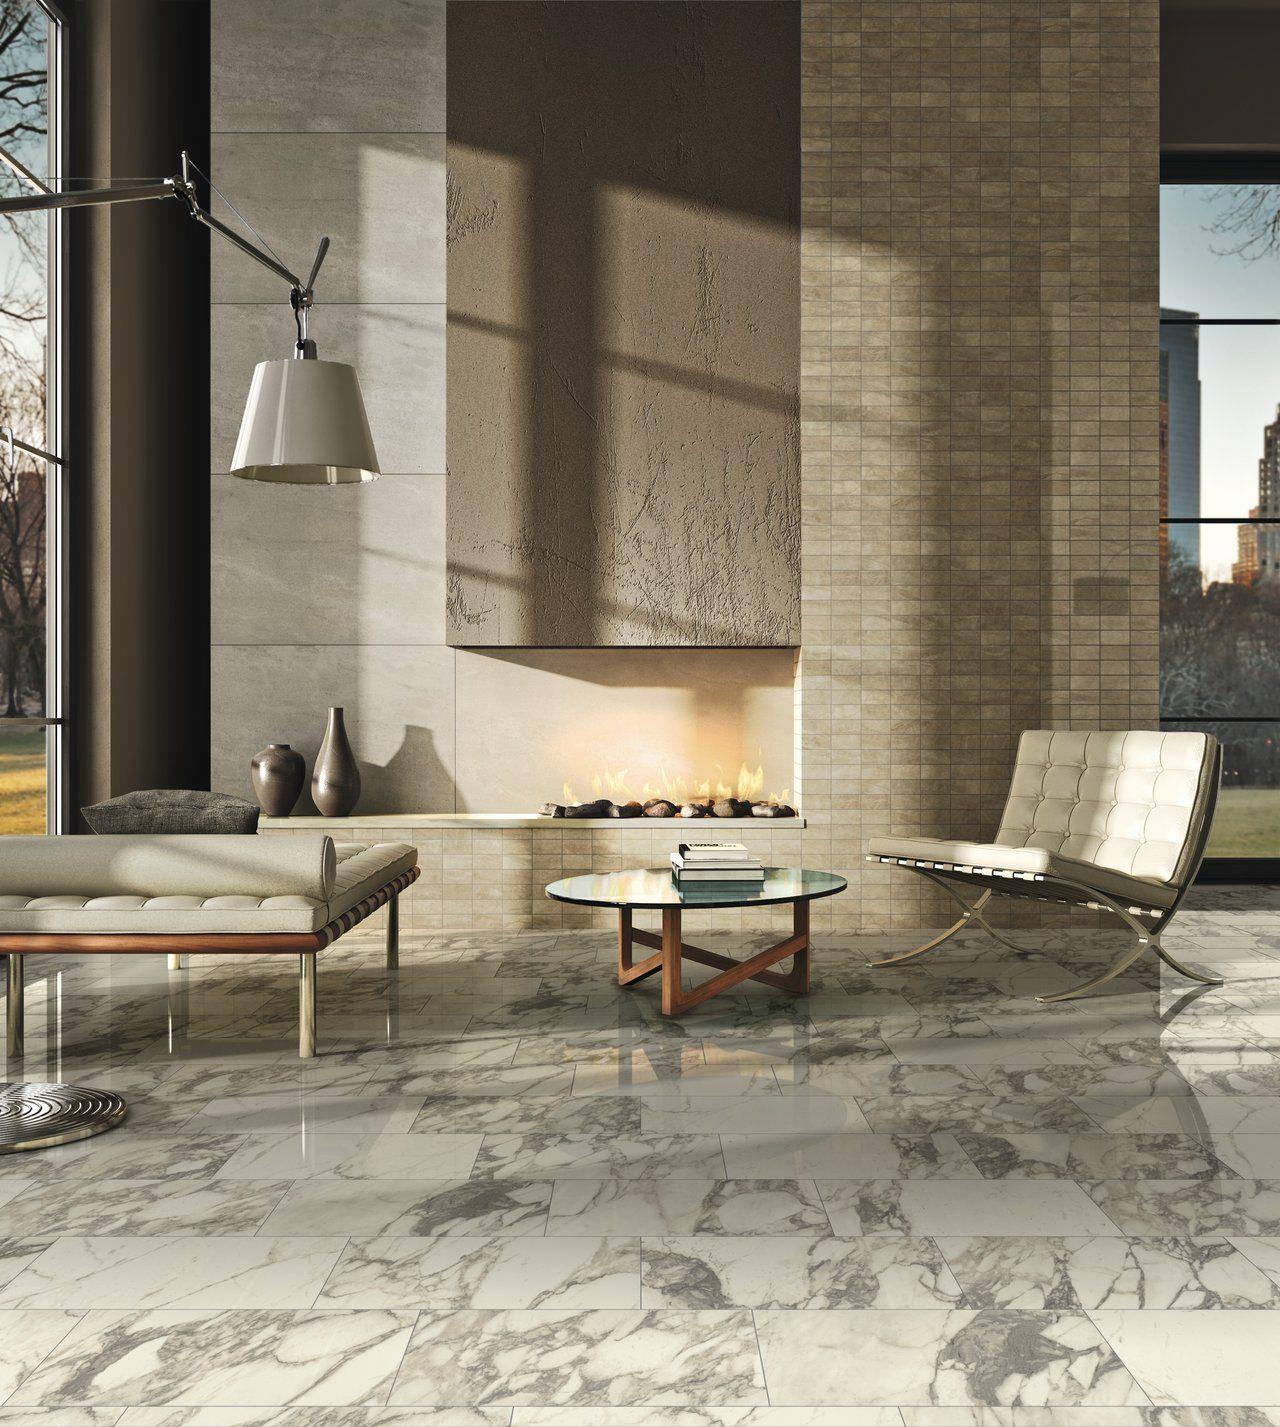 Floor iris us carrara select arabescato 12 x 24 polished wall carrara dailygadgetfo Gallery